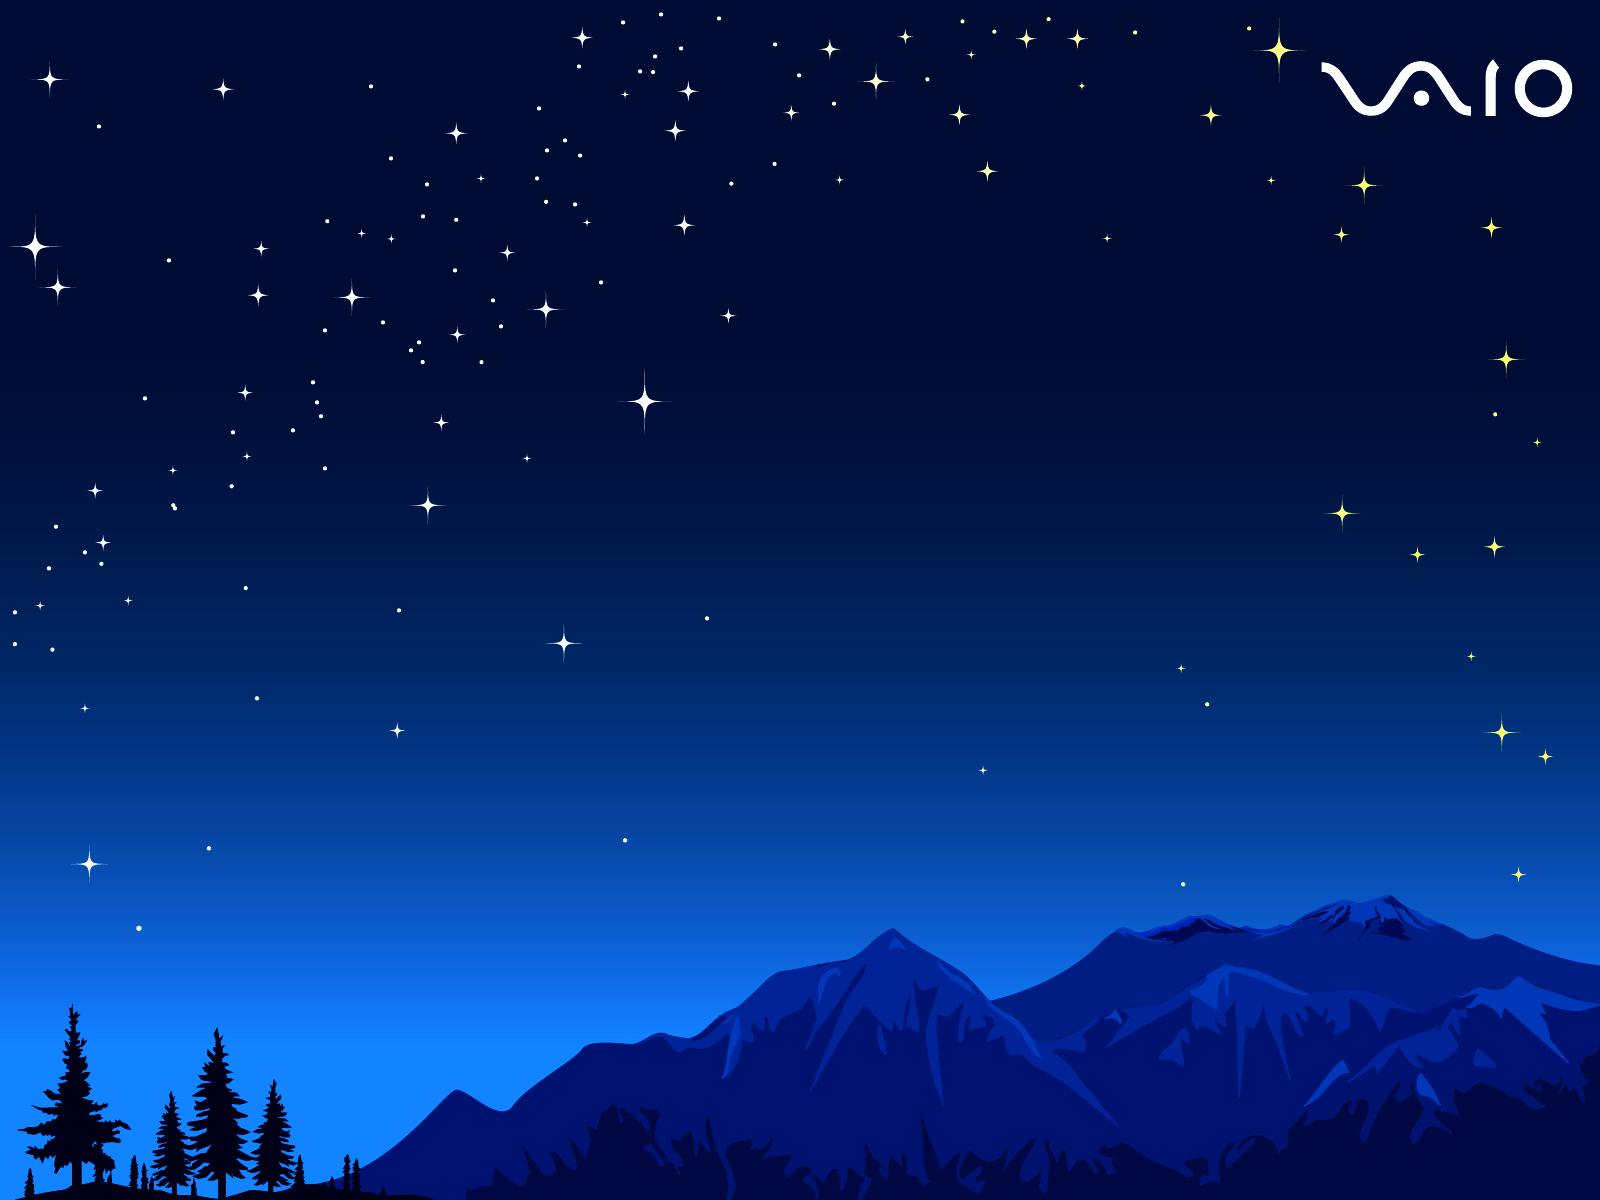 Must see Wallpaper Mountain Windows 10 - Starlit_1600x1200_n  Pic_568962.jpg